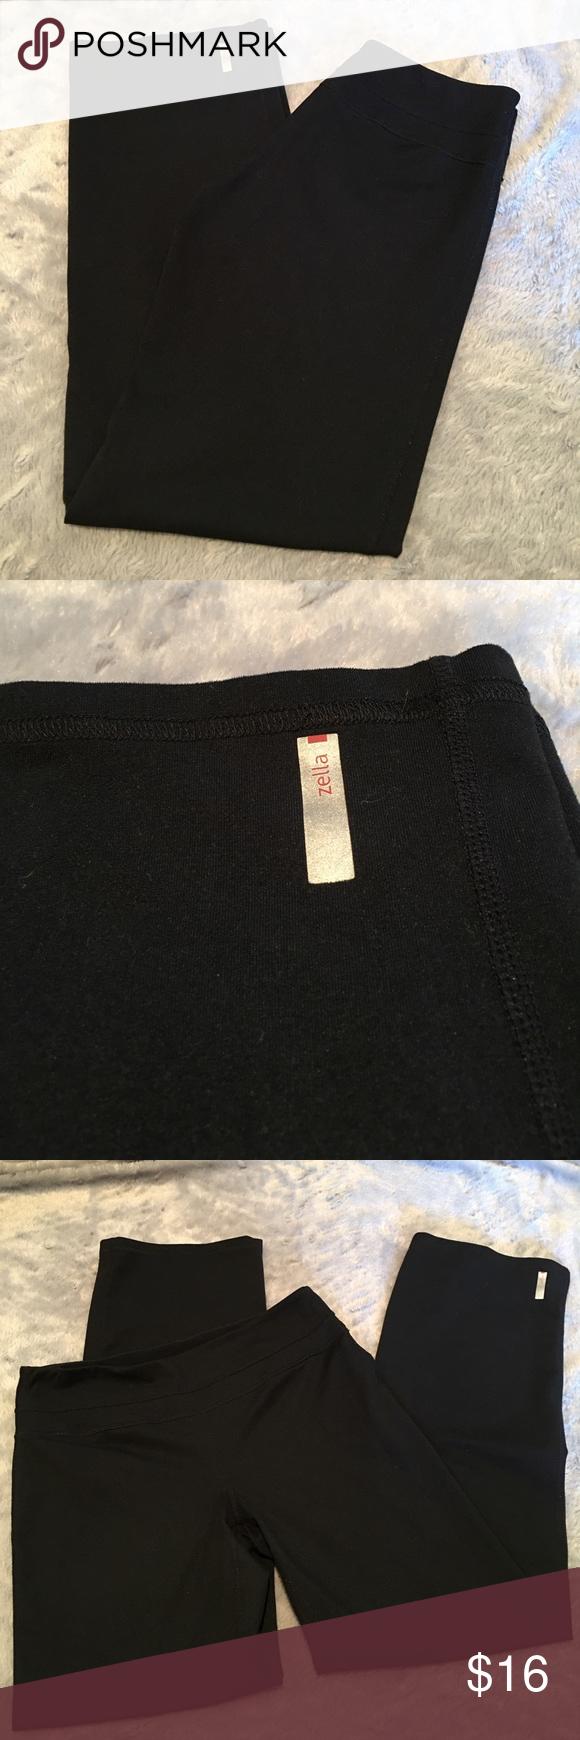 "Zella Yoga Pants Zella Black Yoga Pants. No label so no guarantee of size. Measures like a medium. Inseam 29"". Great condition. ❌No Trades❌ Proceeds go towards feeding the homeless❌ Zella Pants Boot Cut & Flare"